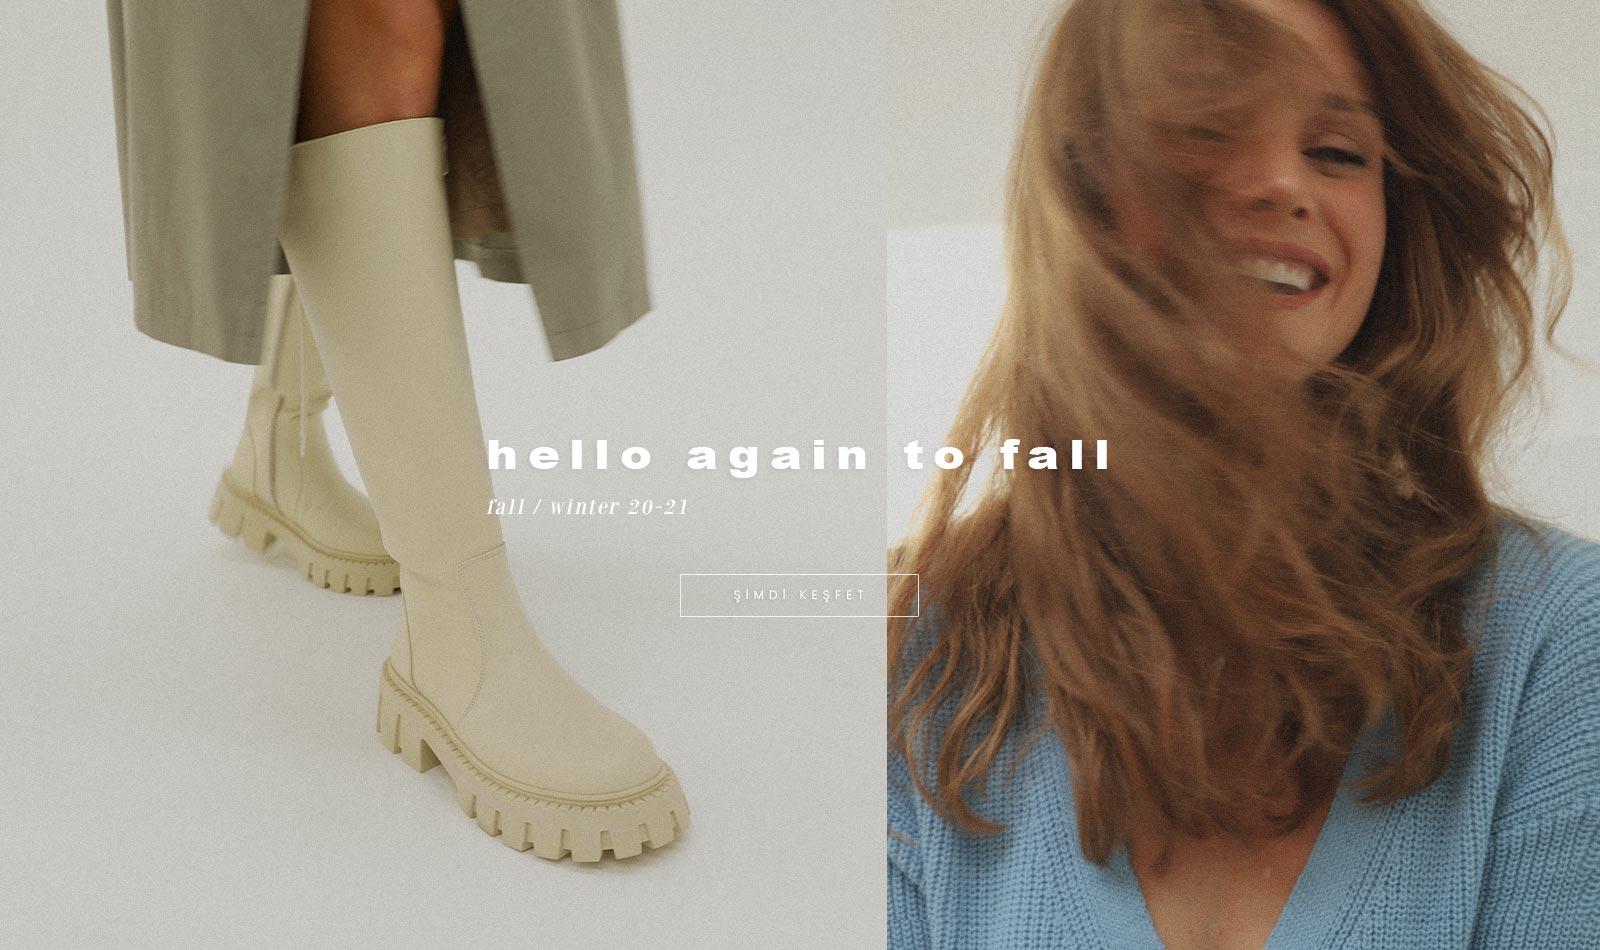 hello again to fall 20-21